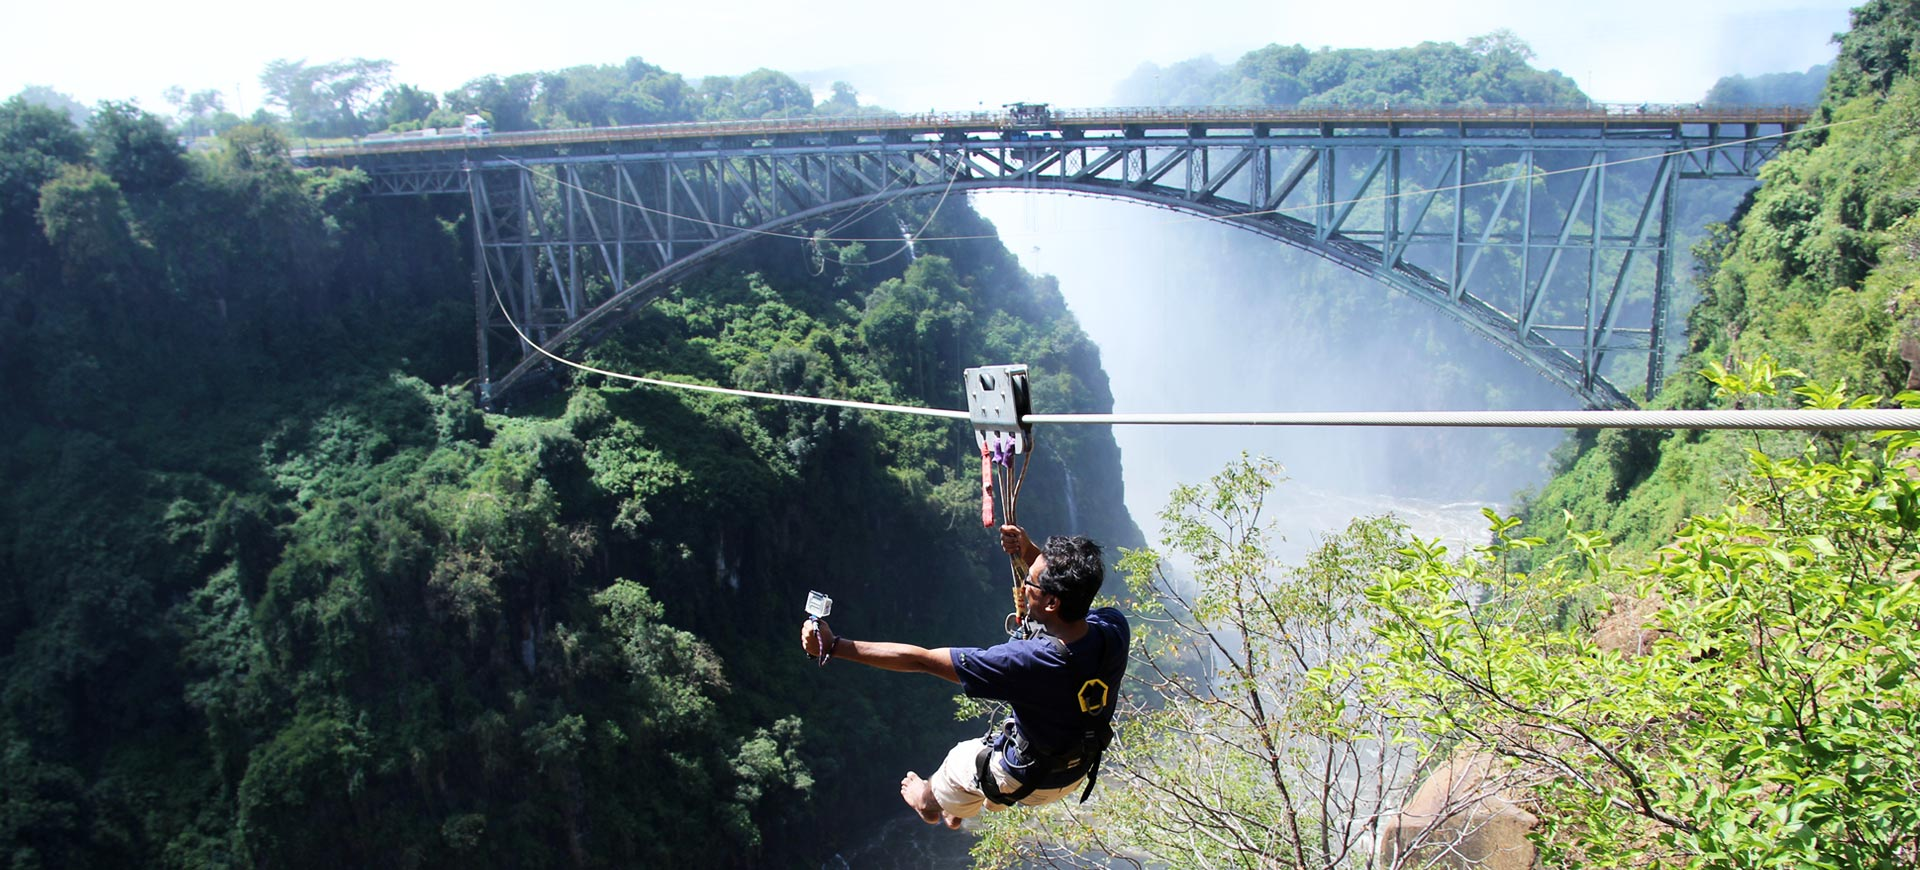 Bridge Slide Vic Falls